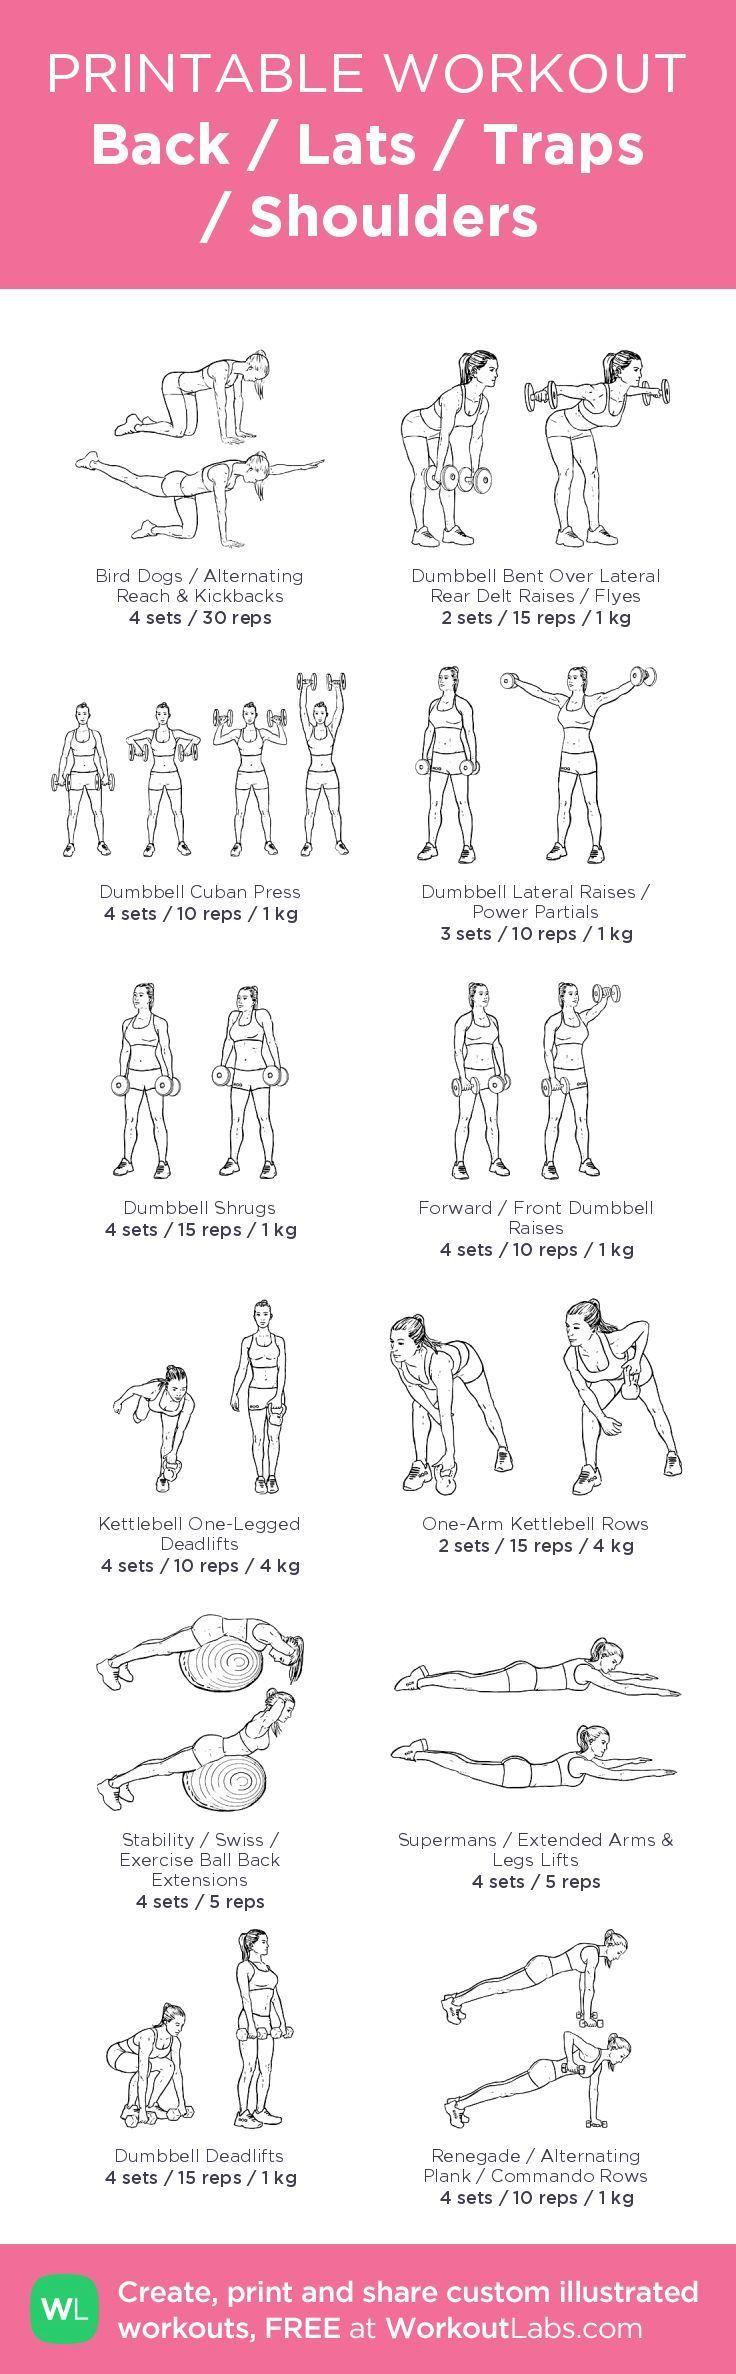 cool Back / Lats / Traps / Shoulders